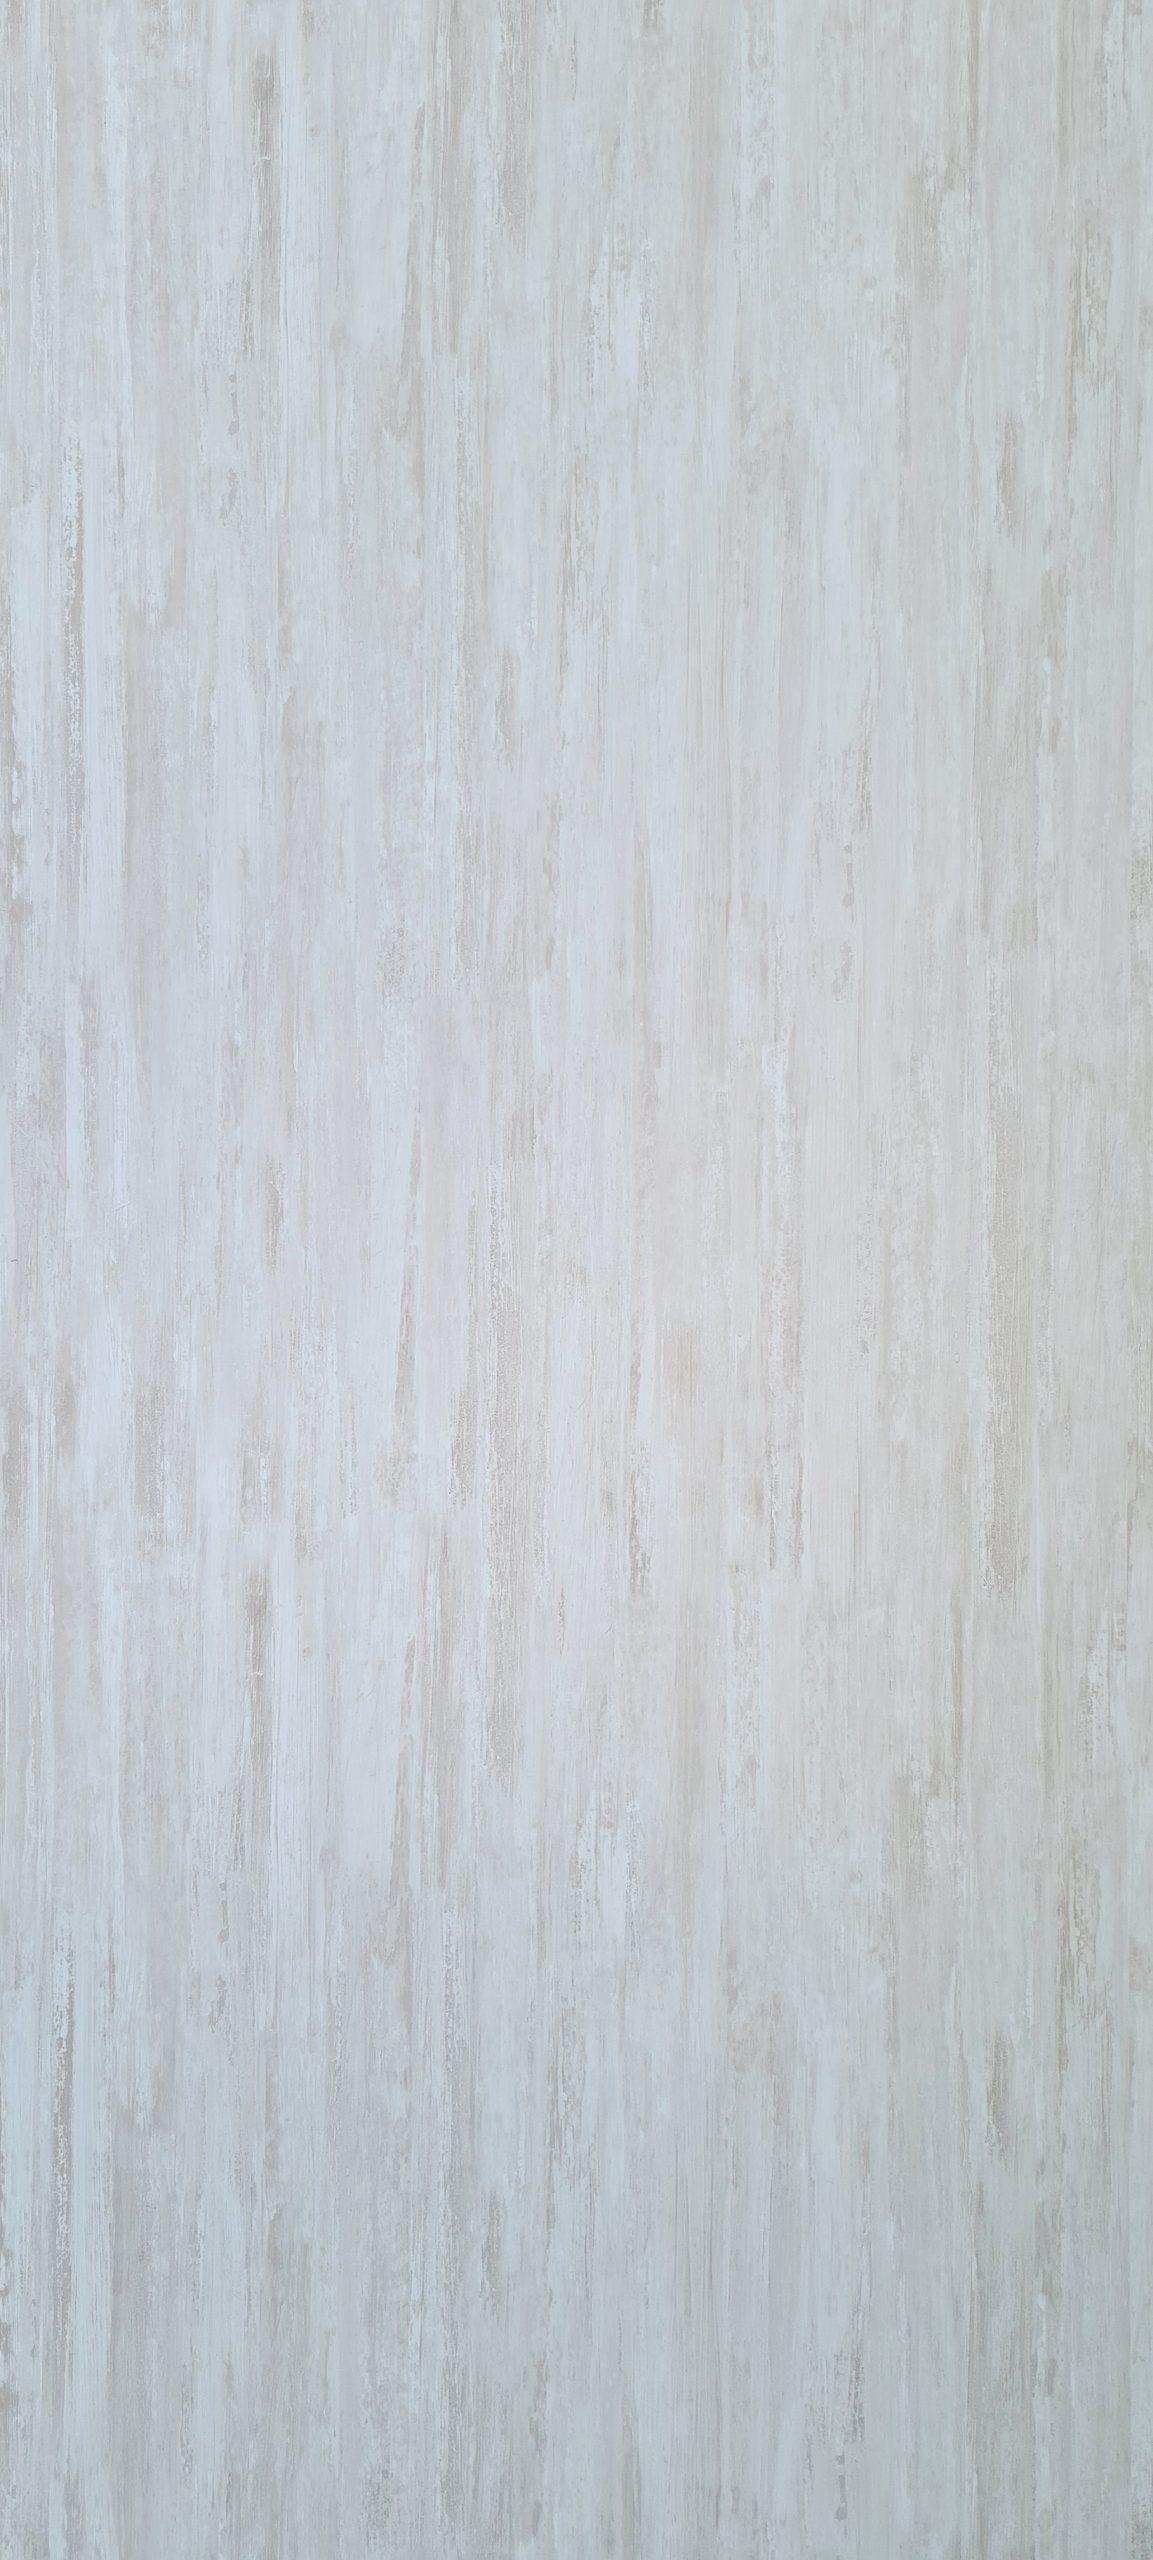 CDM8403 Washed Wood Compact Panel